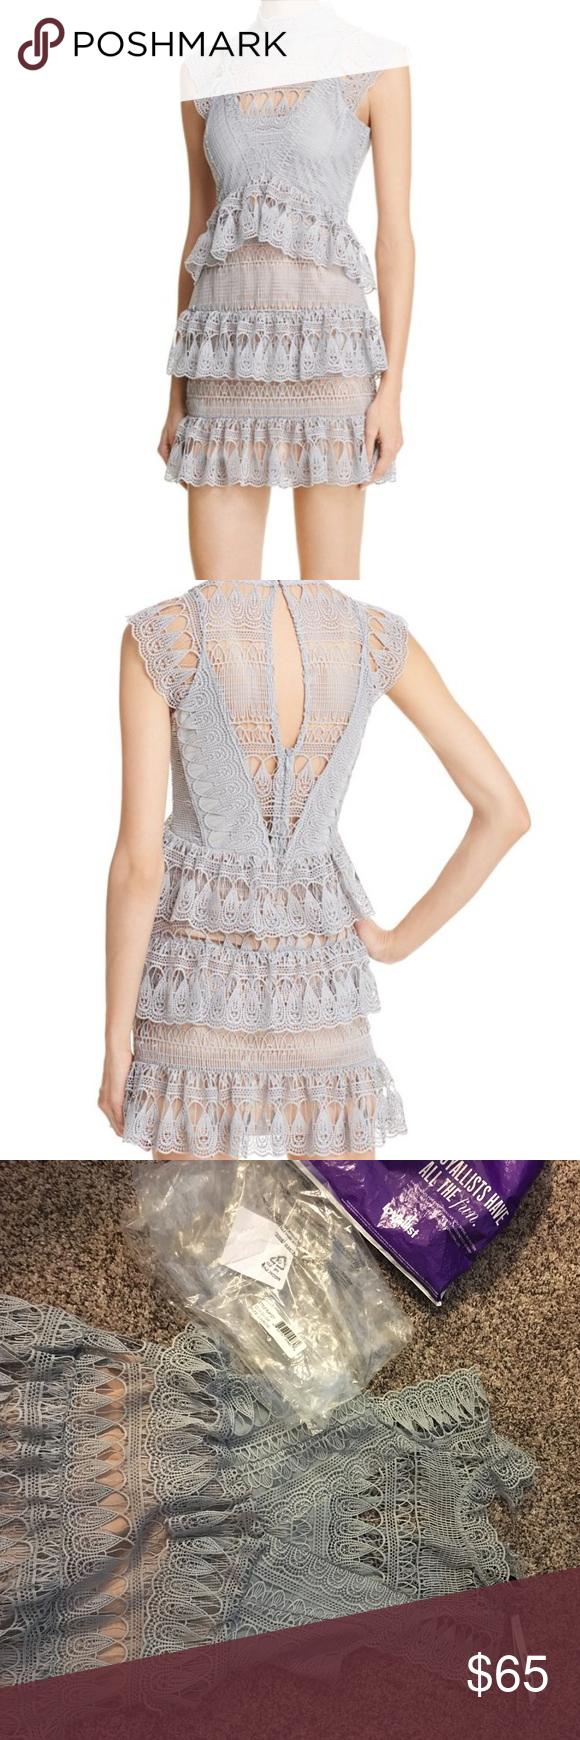 47++ Aqua brand dress ideas